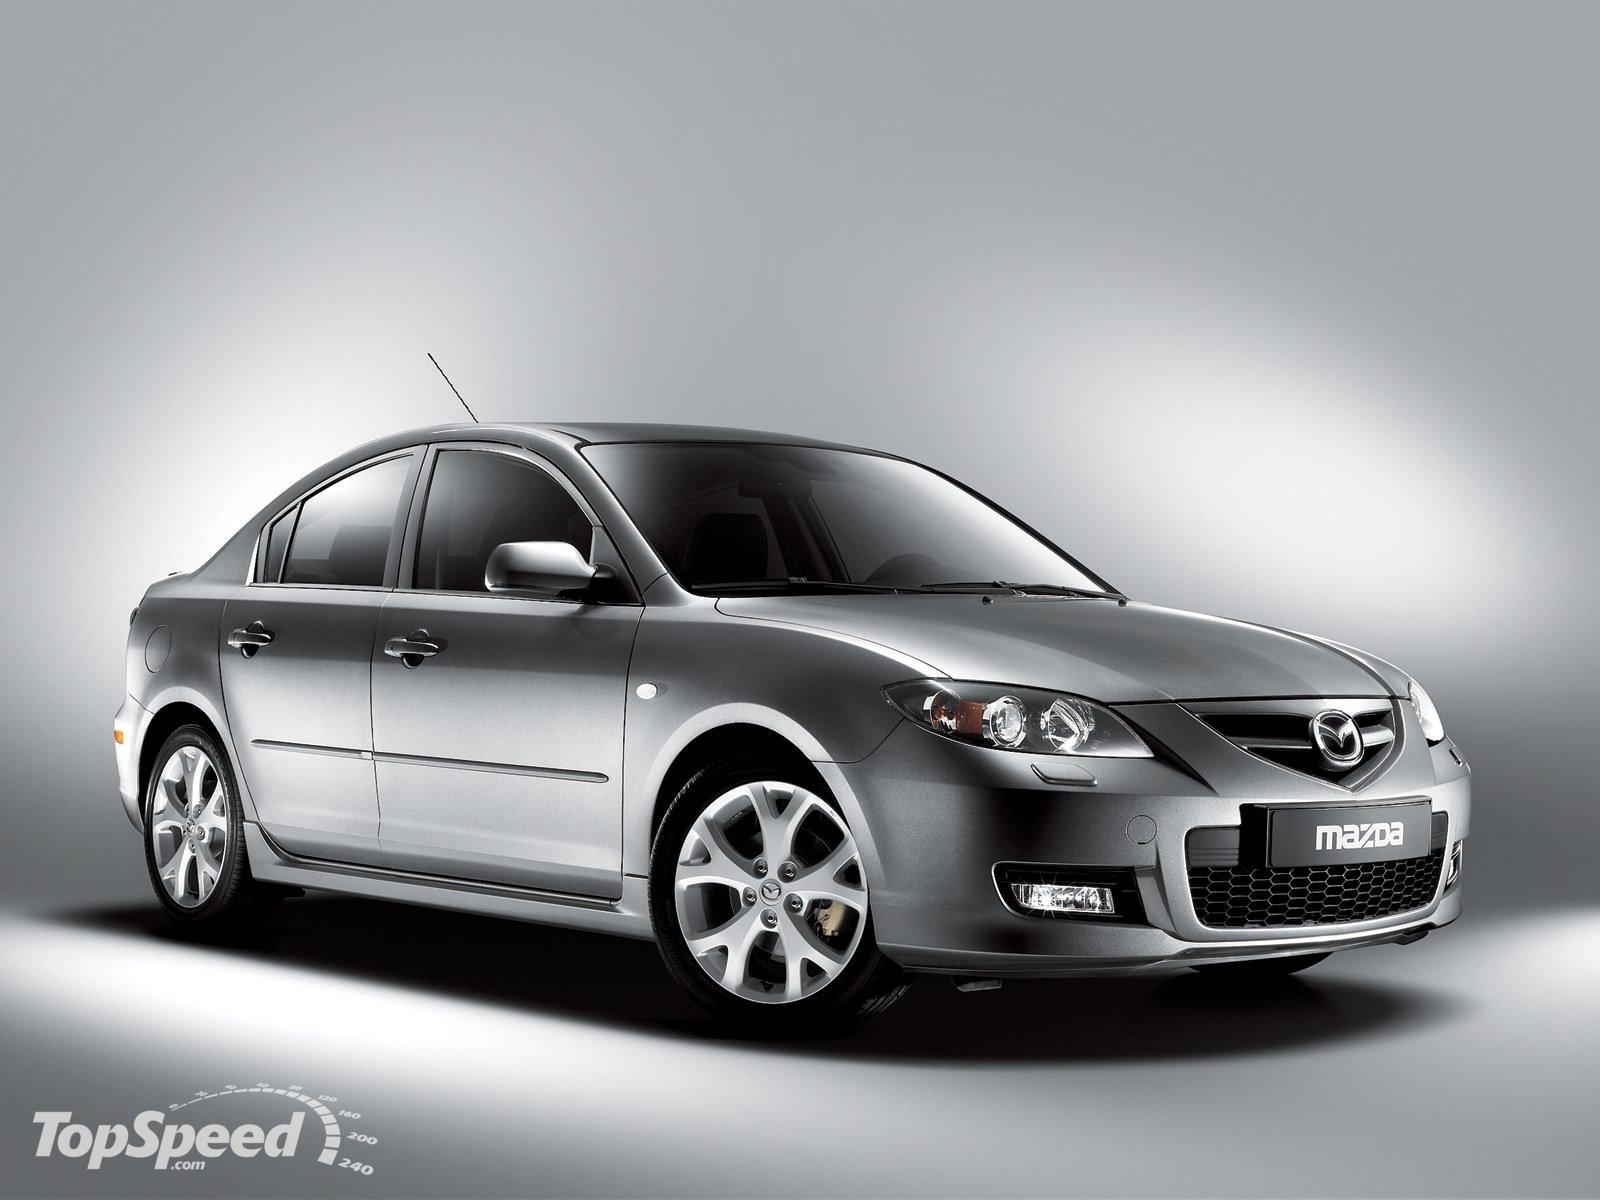 best cars under 20000 nice cars club. Black Bedroom Furniture Sets. Home Design Ideas